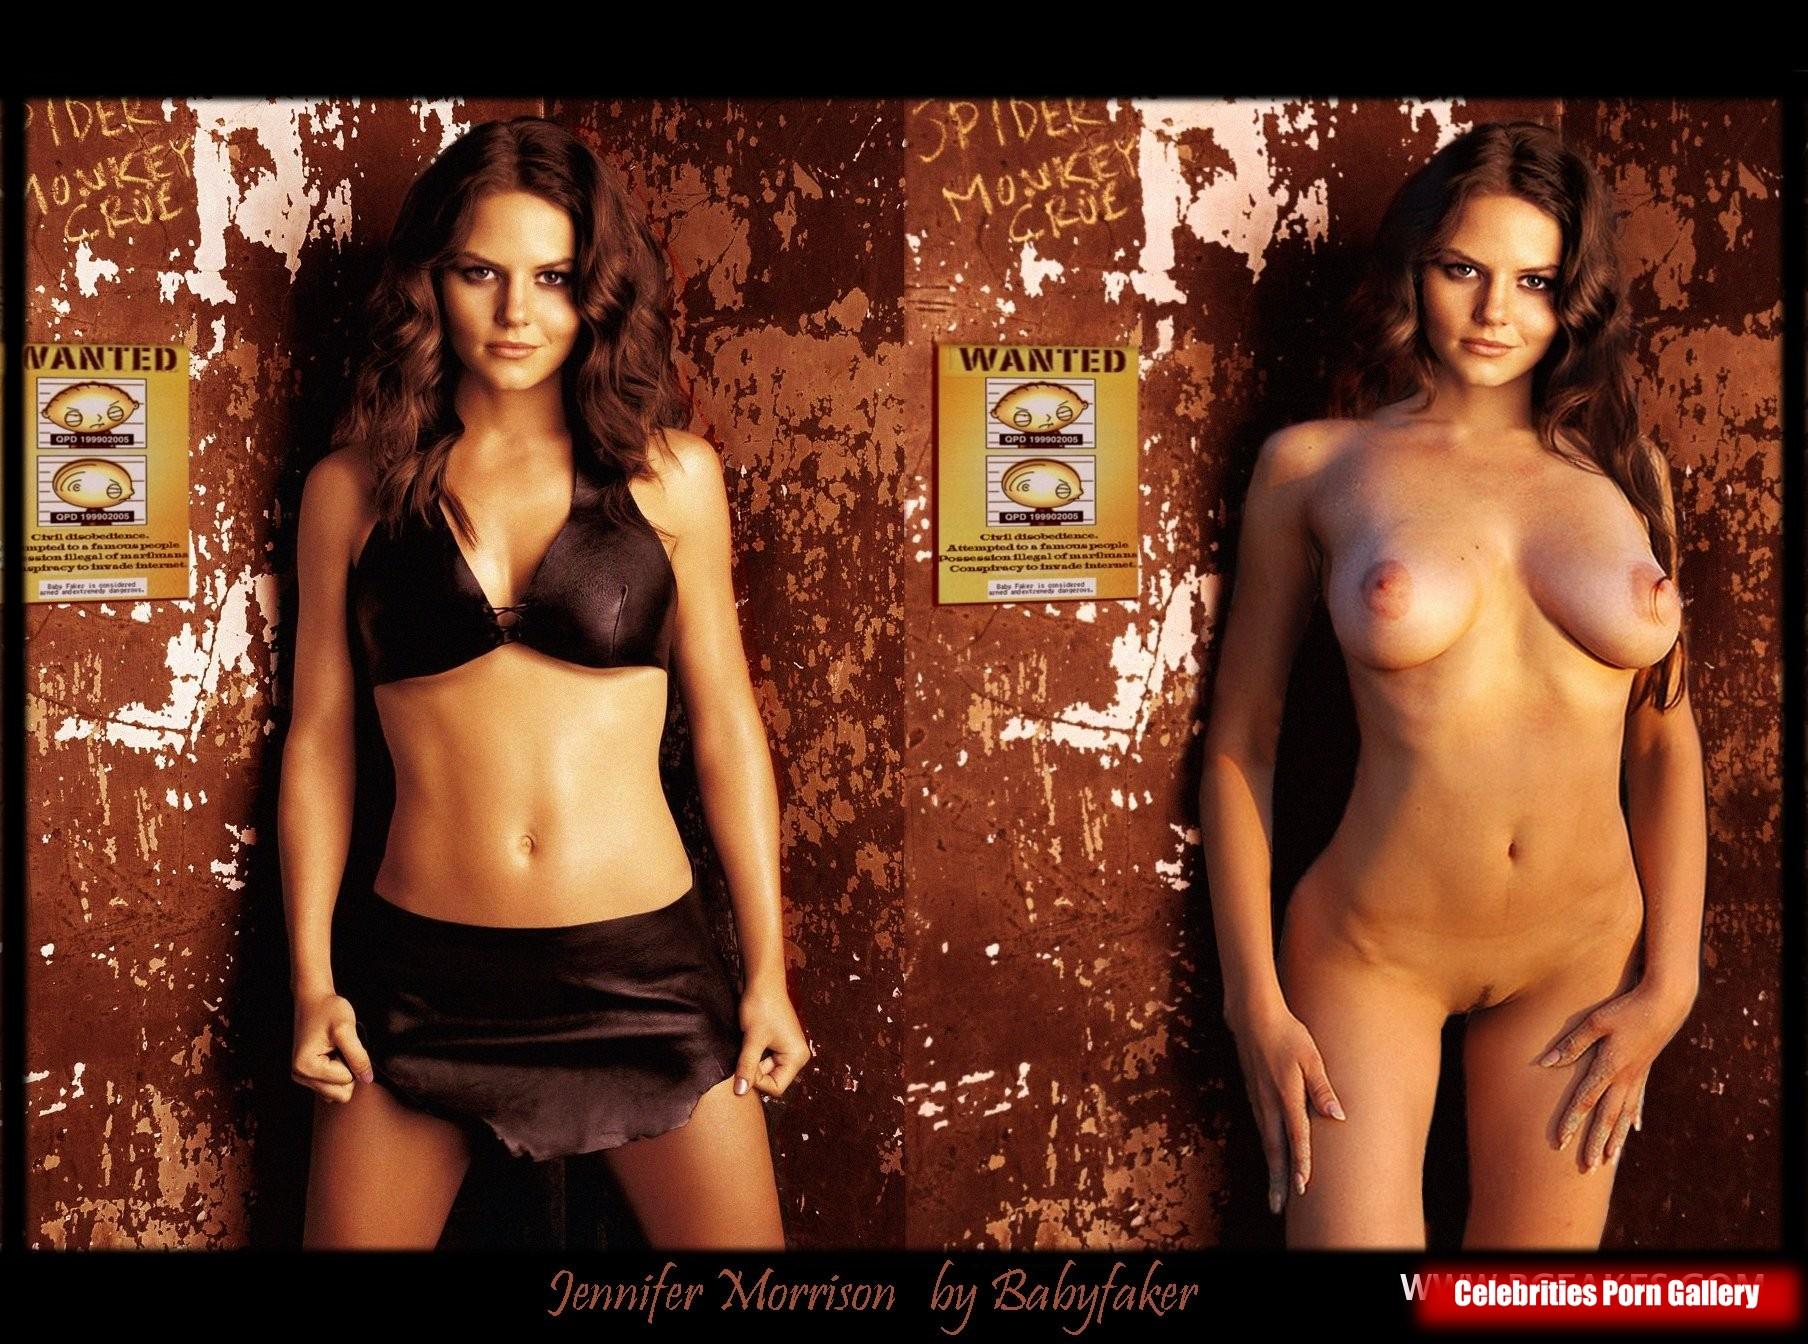 Jennifer morrison naked porn celebrity worship fakes